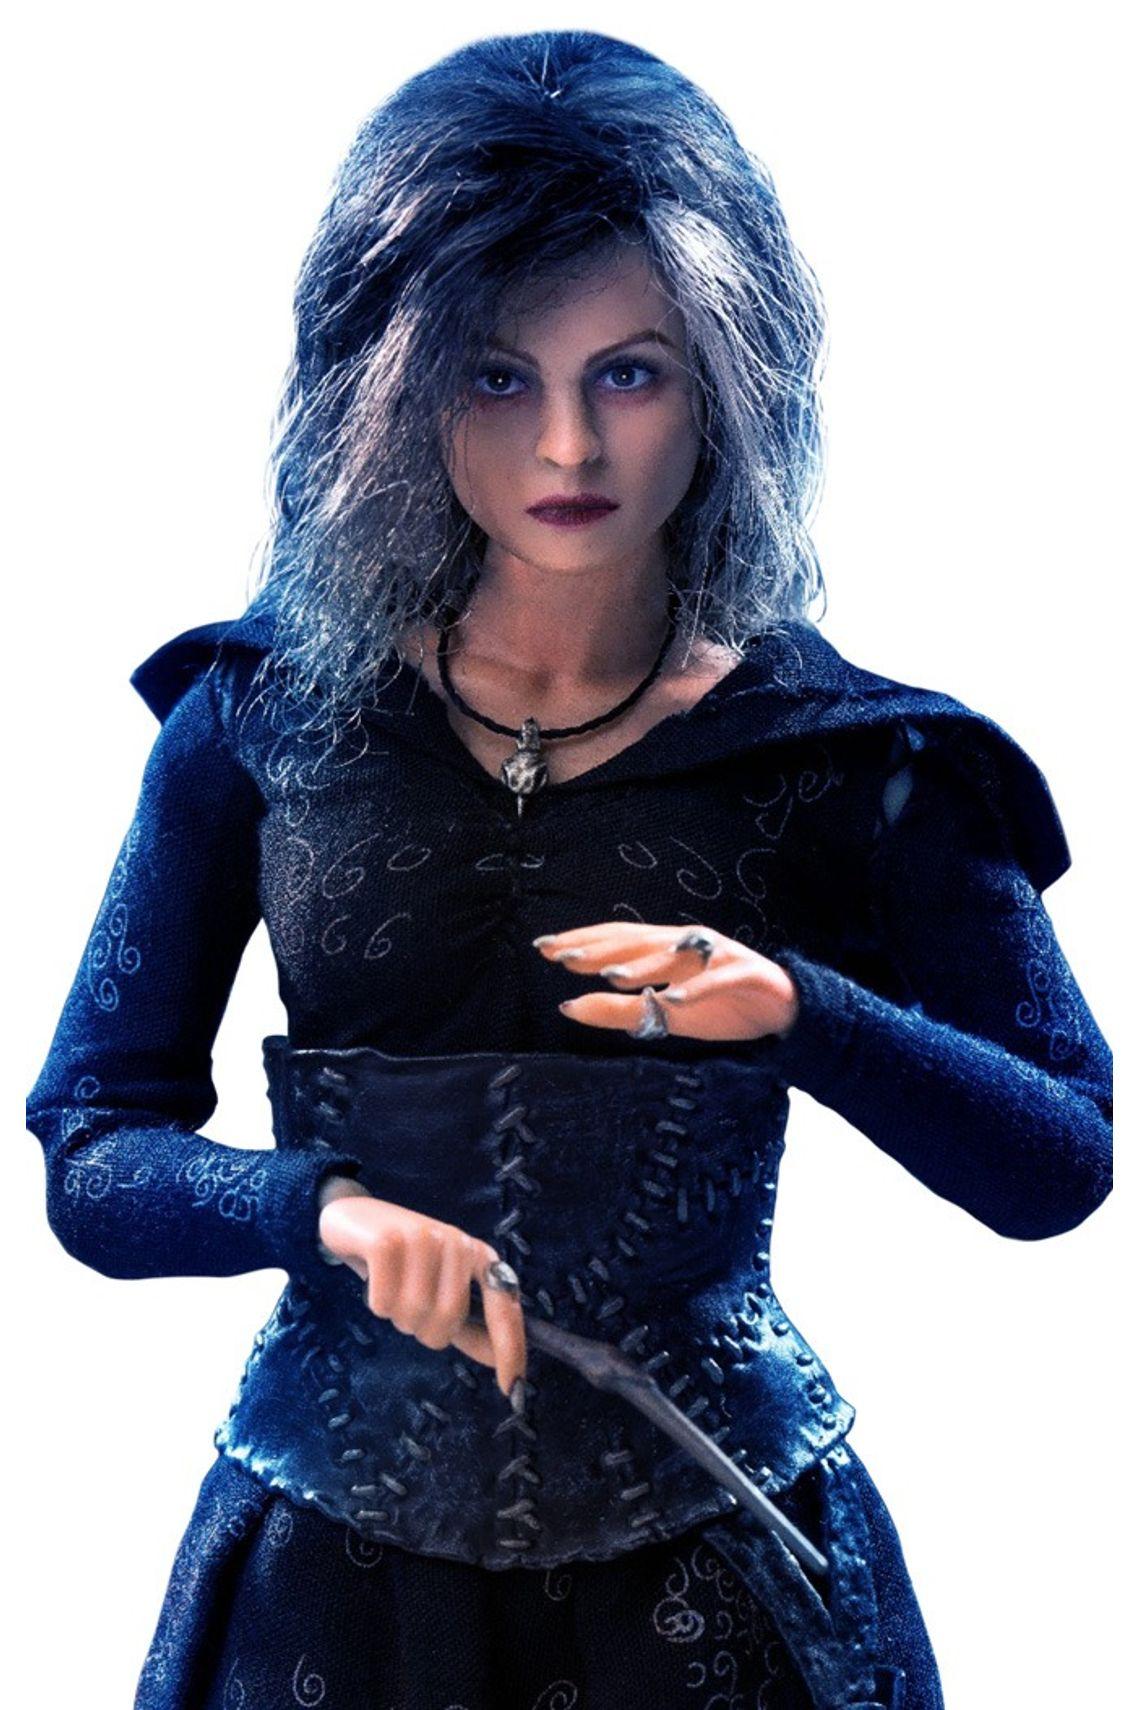 Action Figure Bellatrix Lestrange Regular Ver. Normal Version: Harry Potter Escala 1/8 - Star Ace